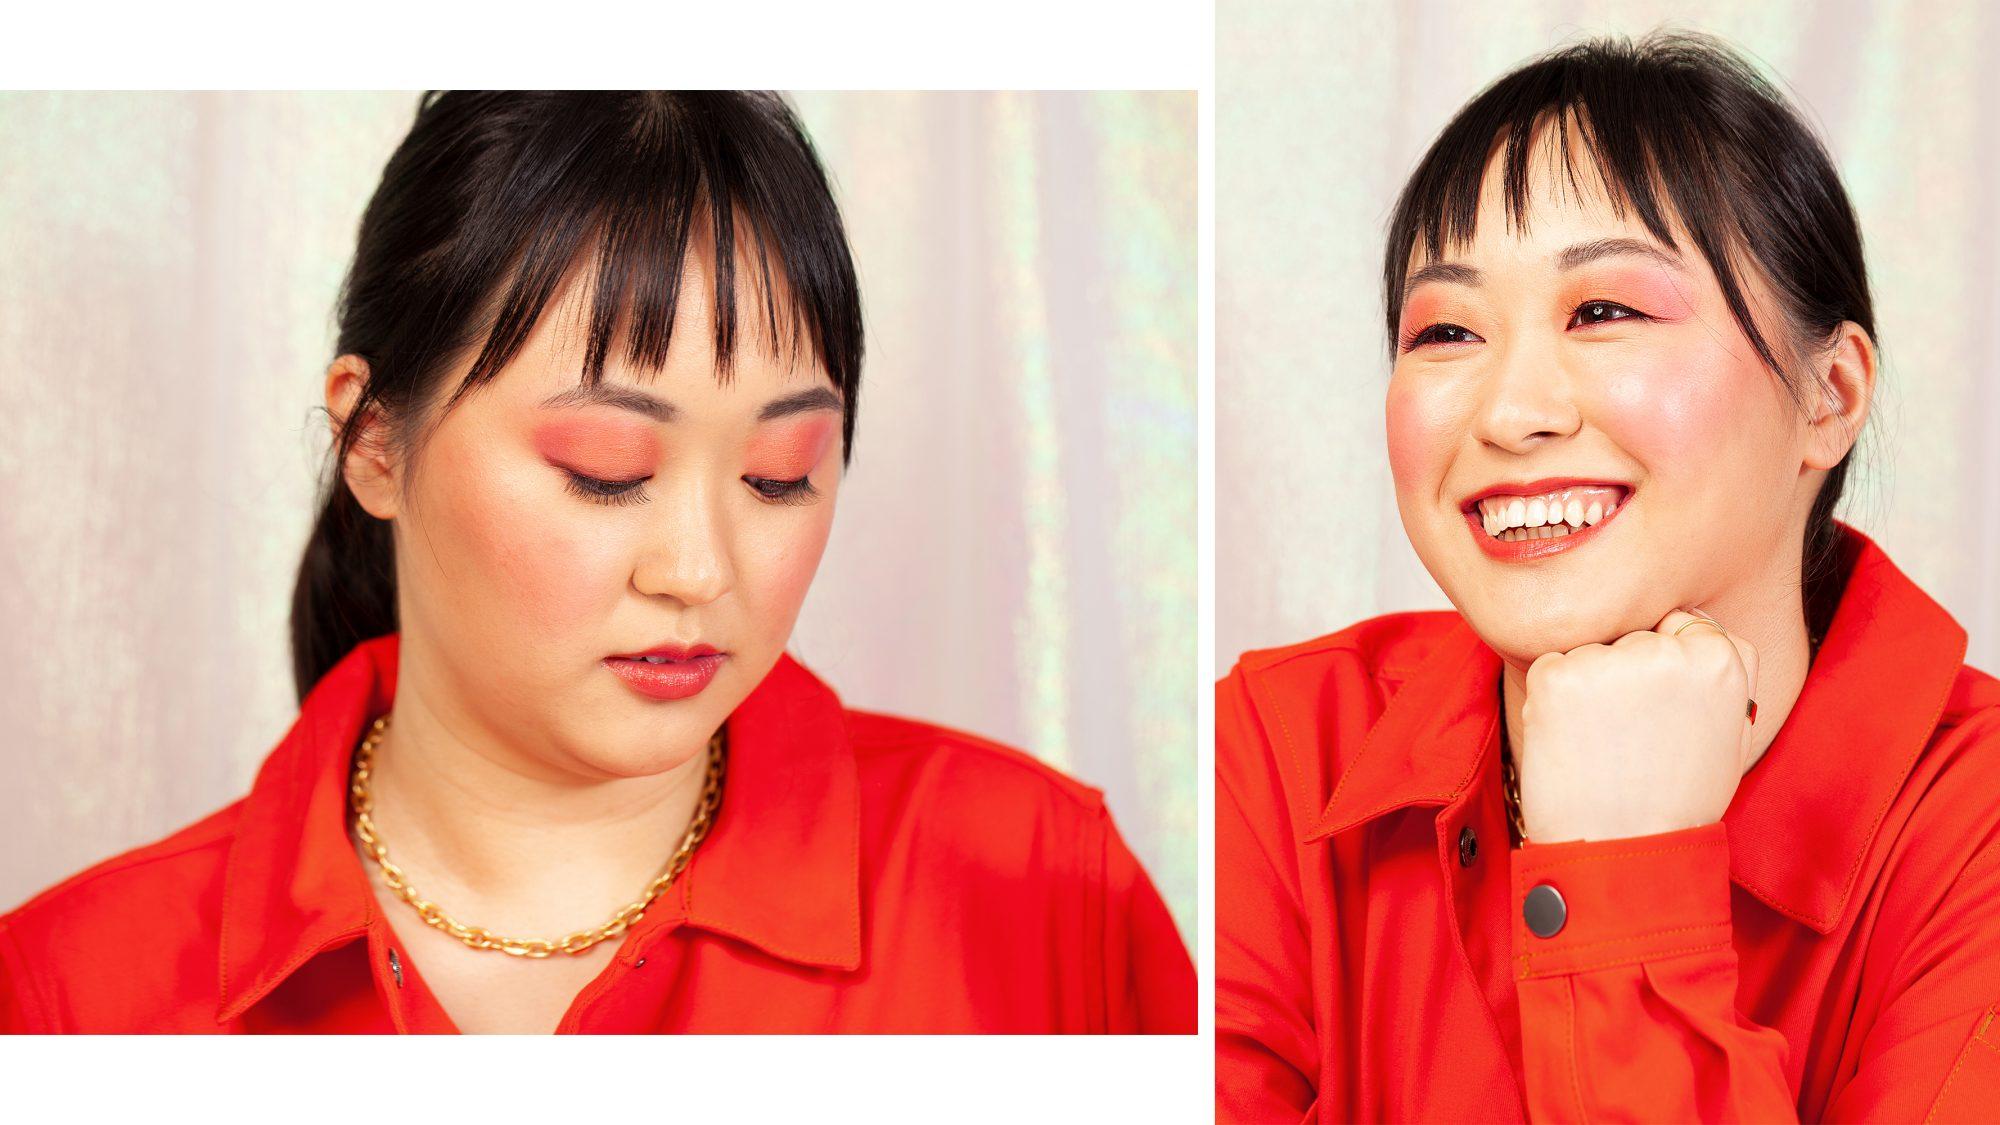 061721-HCF-Monochromatic-Bold-Makeup